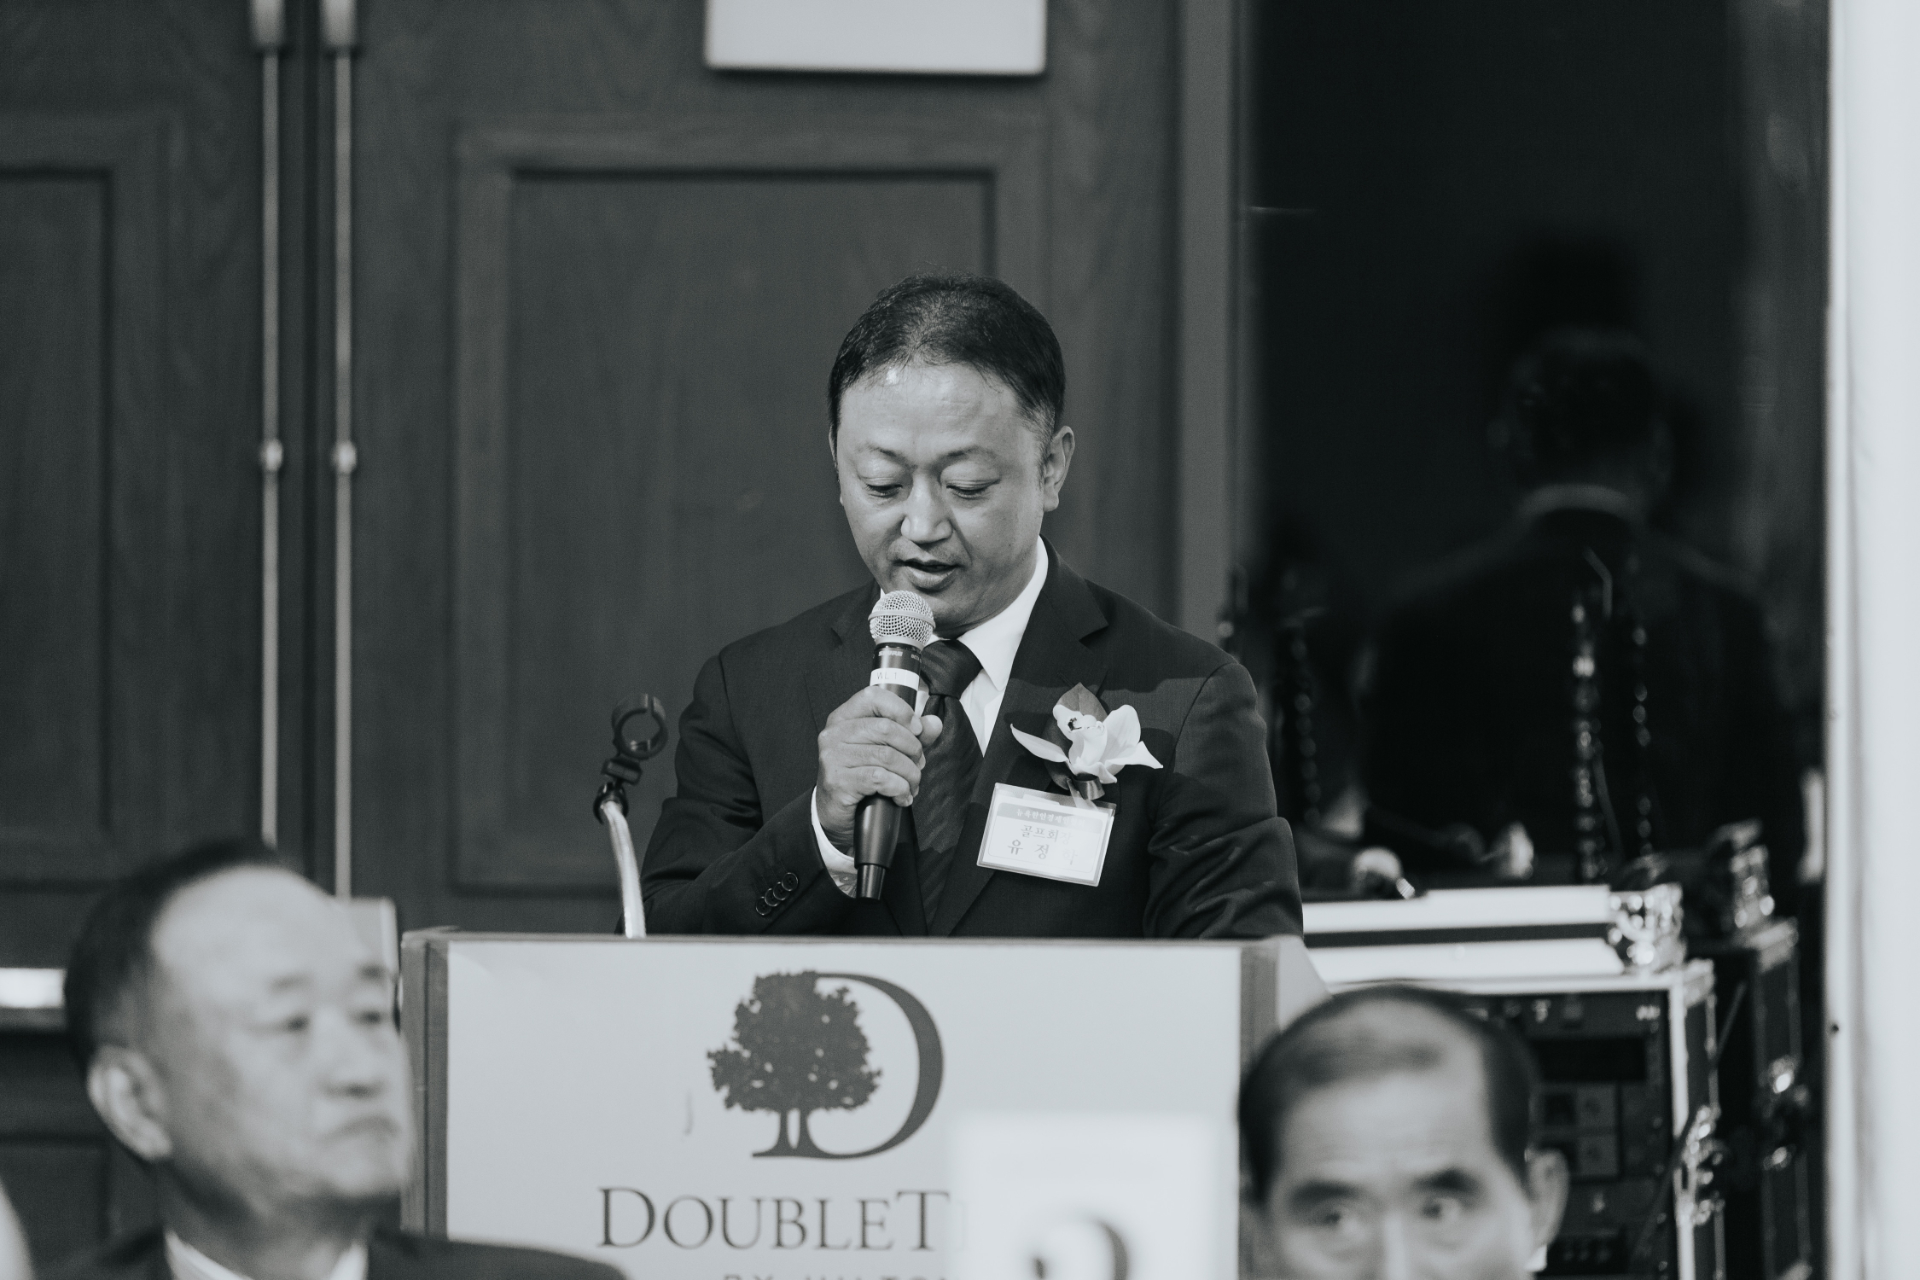 https://nykbi.com/new/wp-content/uploads/2019/07/190607-NYKBI-Inauguration-Ceremony-017.jpg